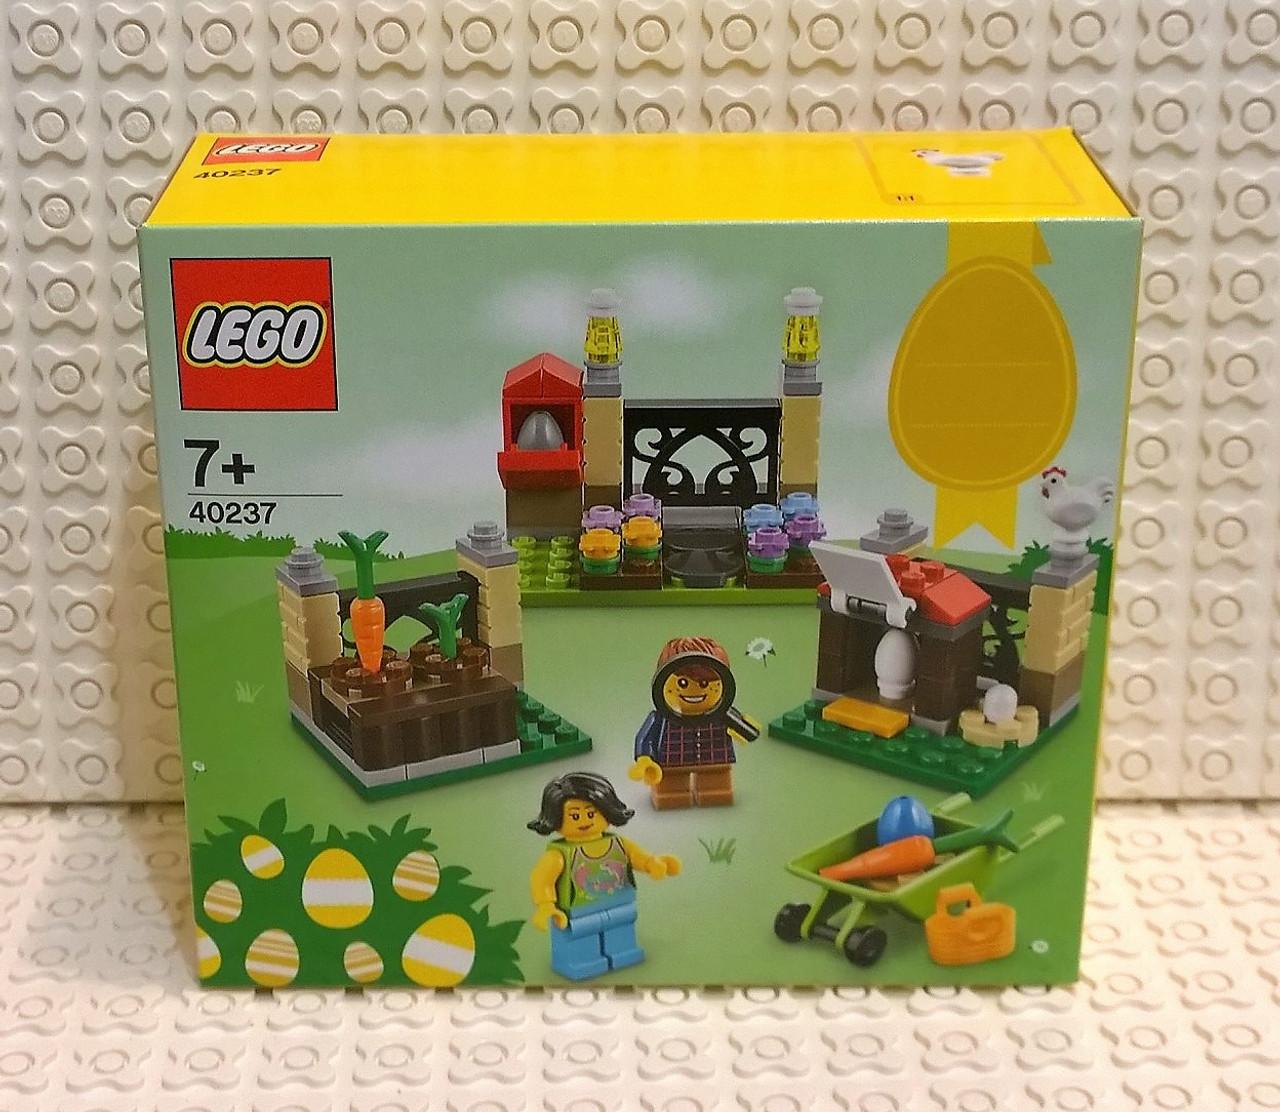 40237 Lego Easter Egg Hunt Brick Lady